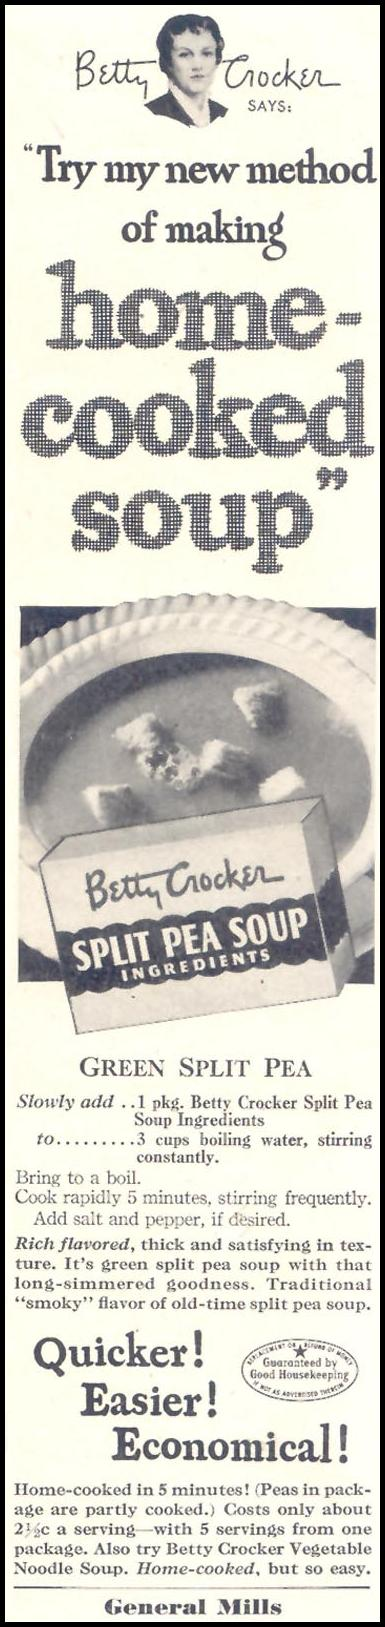 BETTY CROCKER SPLIT PEA SOUP MIX GOOD HOUSEKEEPING 07/01/1949 p. 27